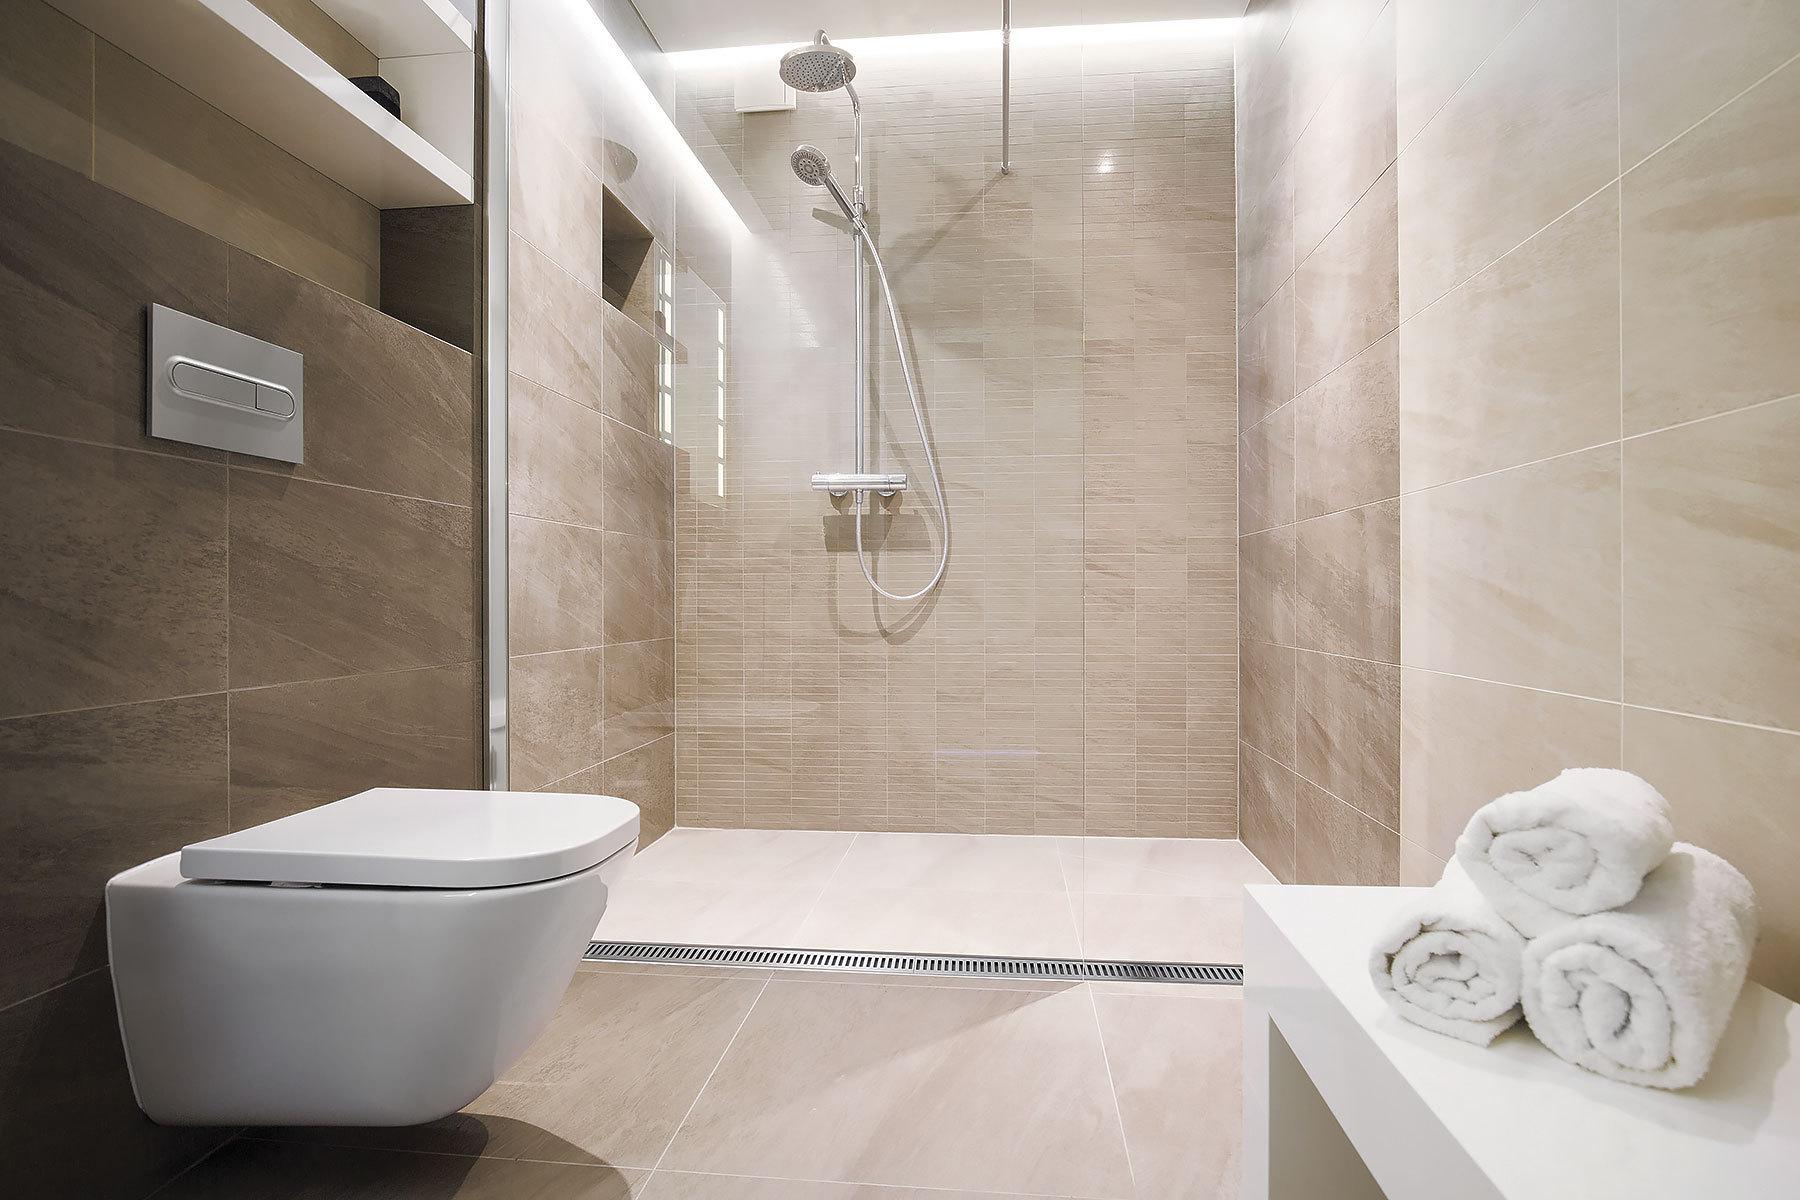 Quickdrain Usa Kits Streamline Tub To Shower Conversions